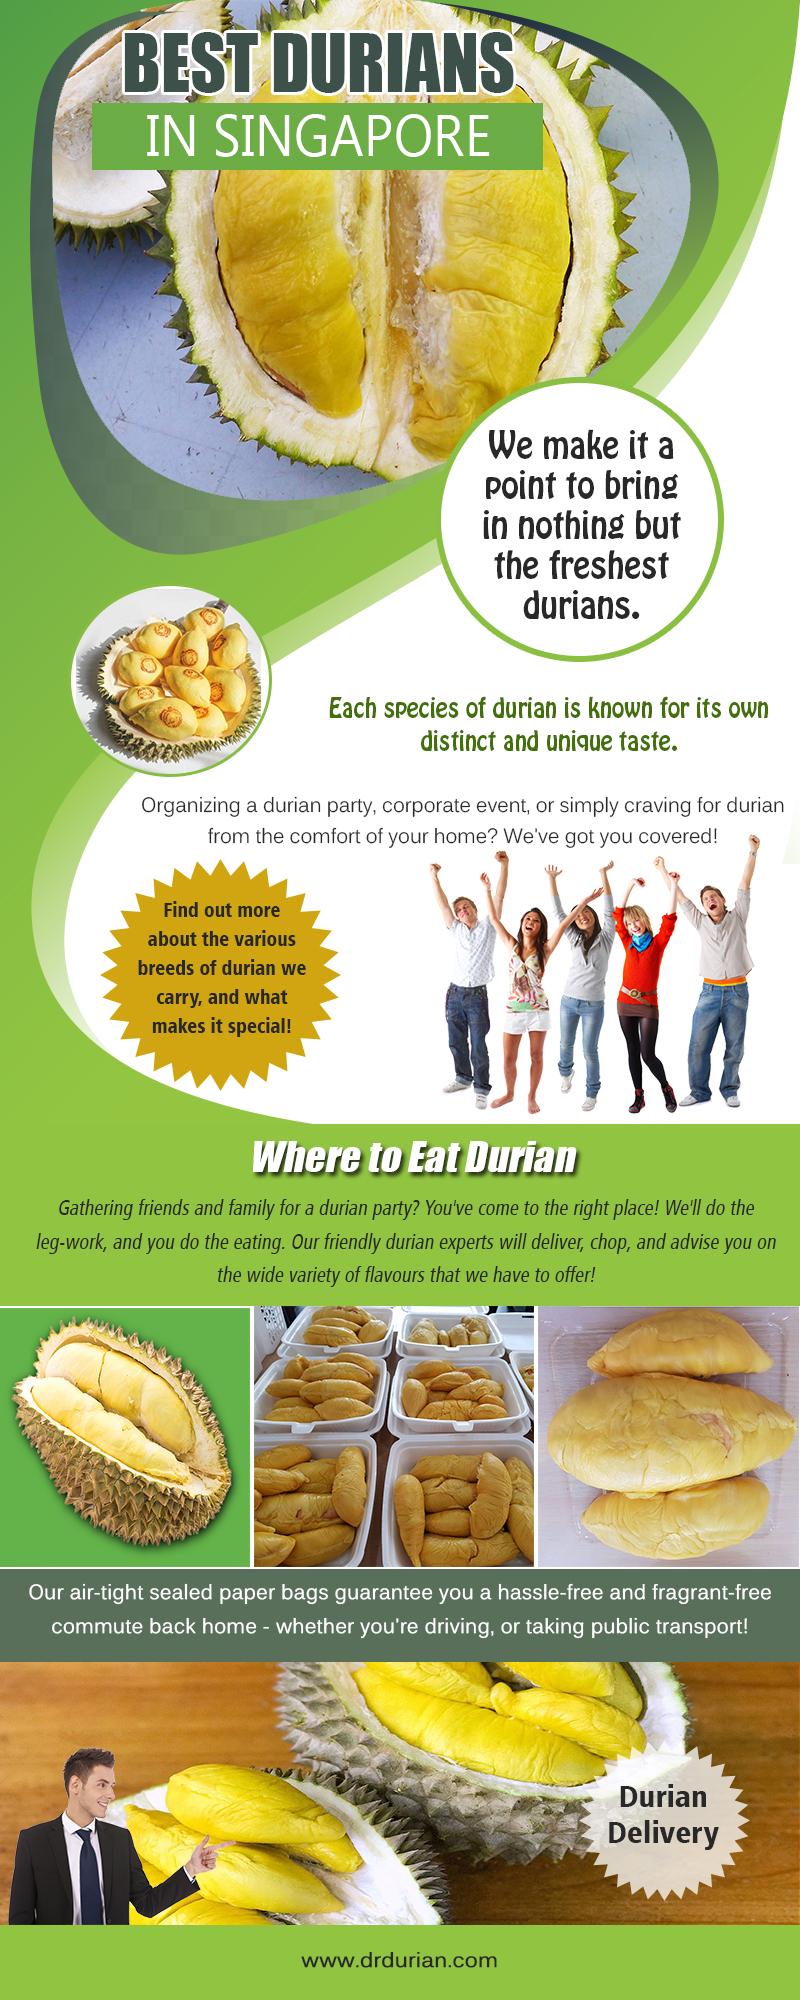 Best Durians in Singapore